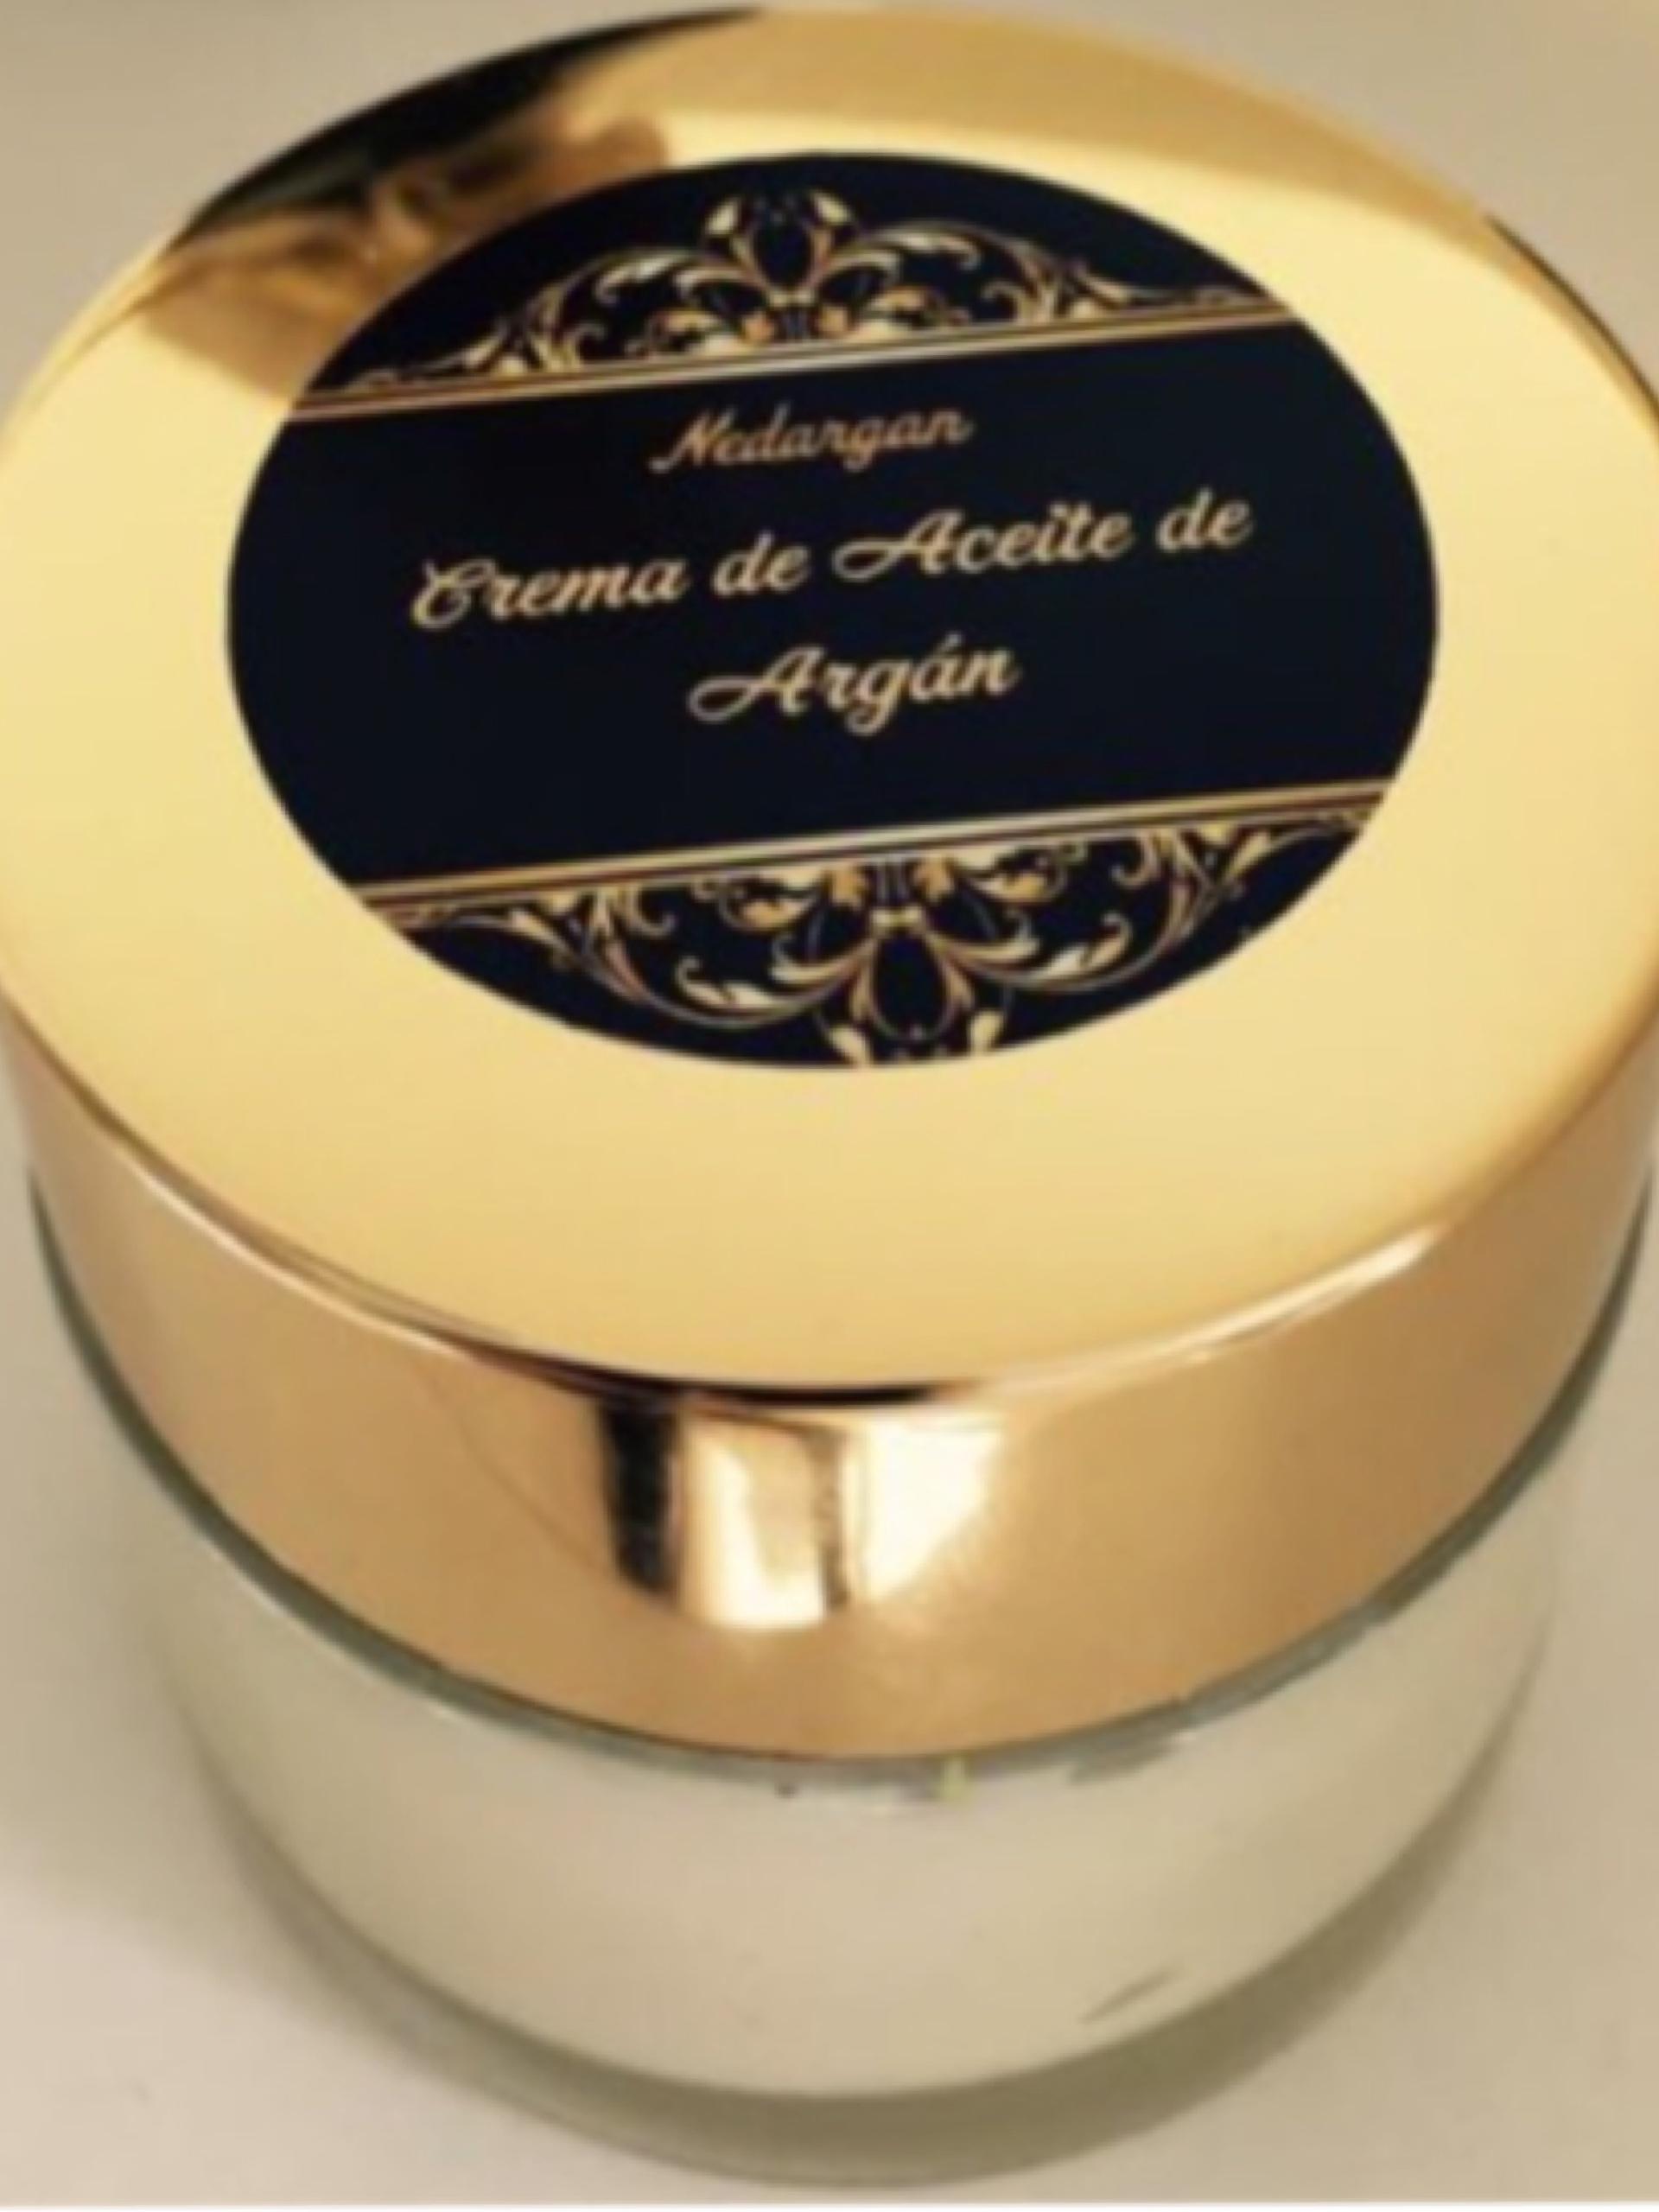 Crema Regenerante de Aceite de Argàn